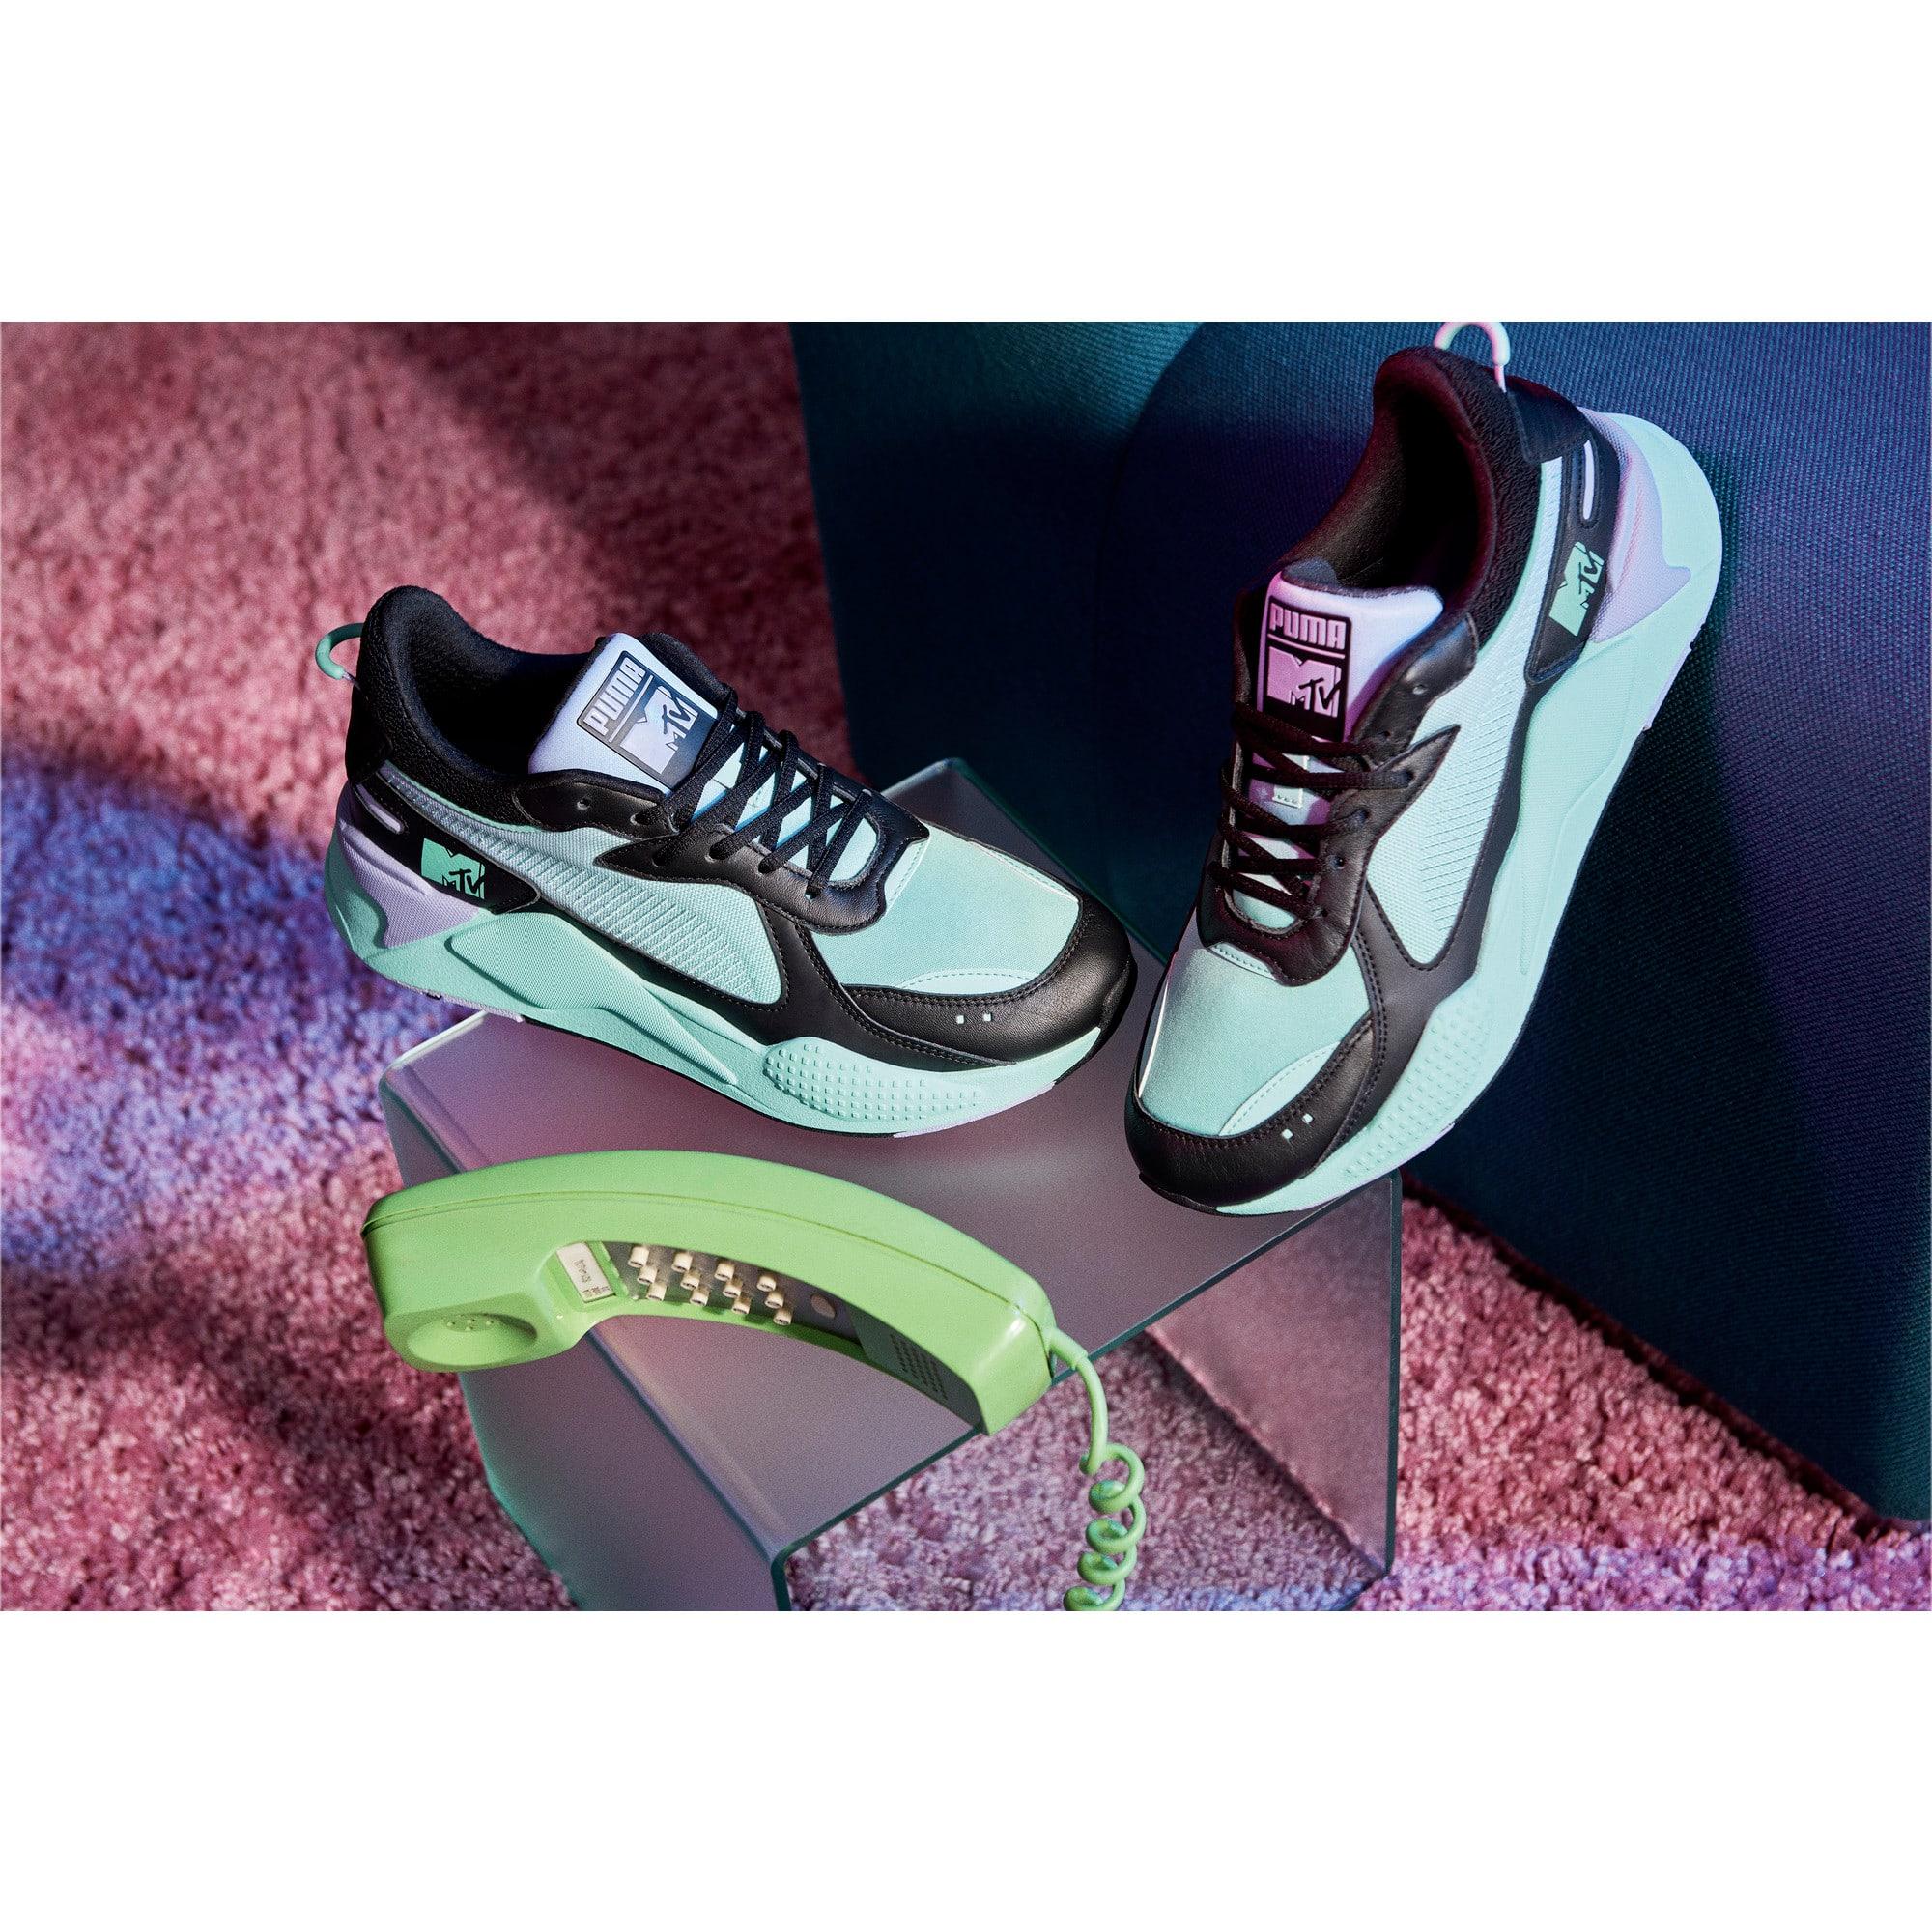 Thumbnail 8 of RS-X Tracks MTV Gradient Gloom Sneakers, Puma Black-Sweet Lavender, medium